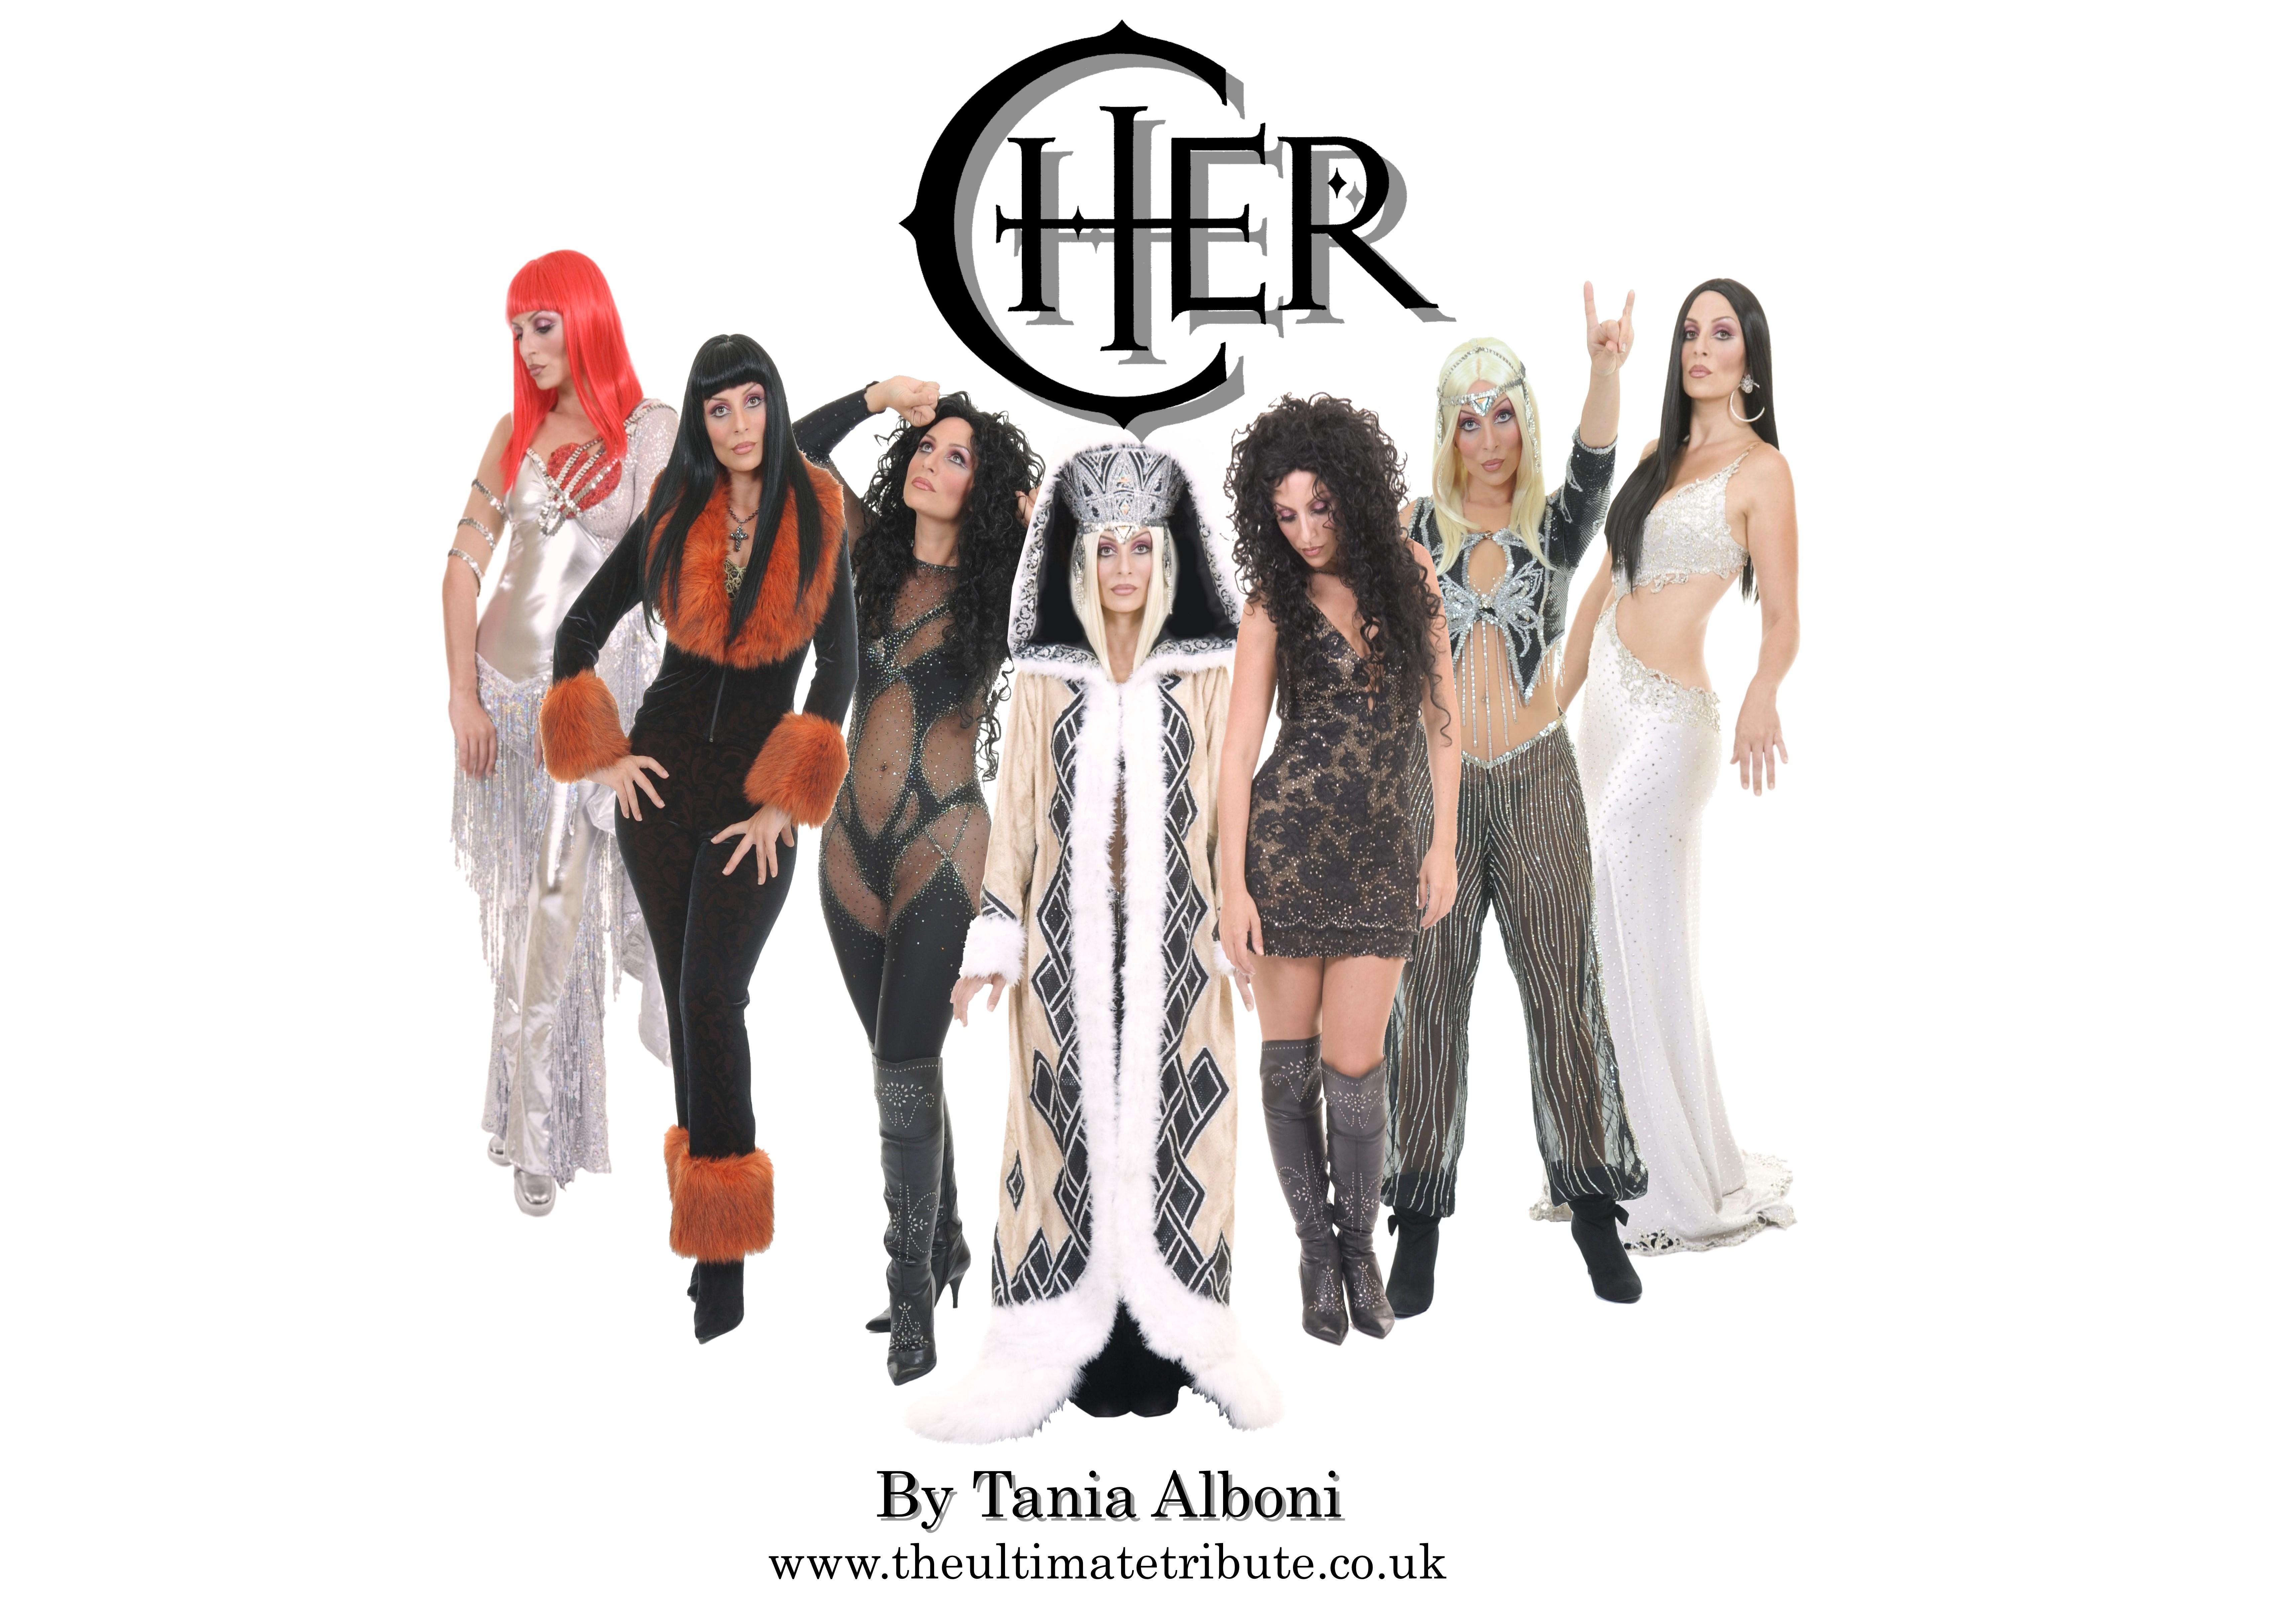 cher_poster_hi